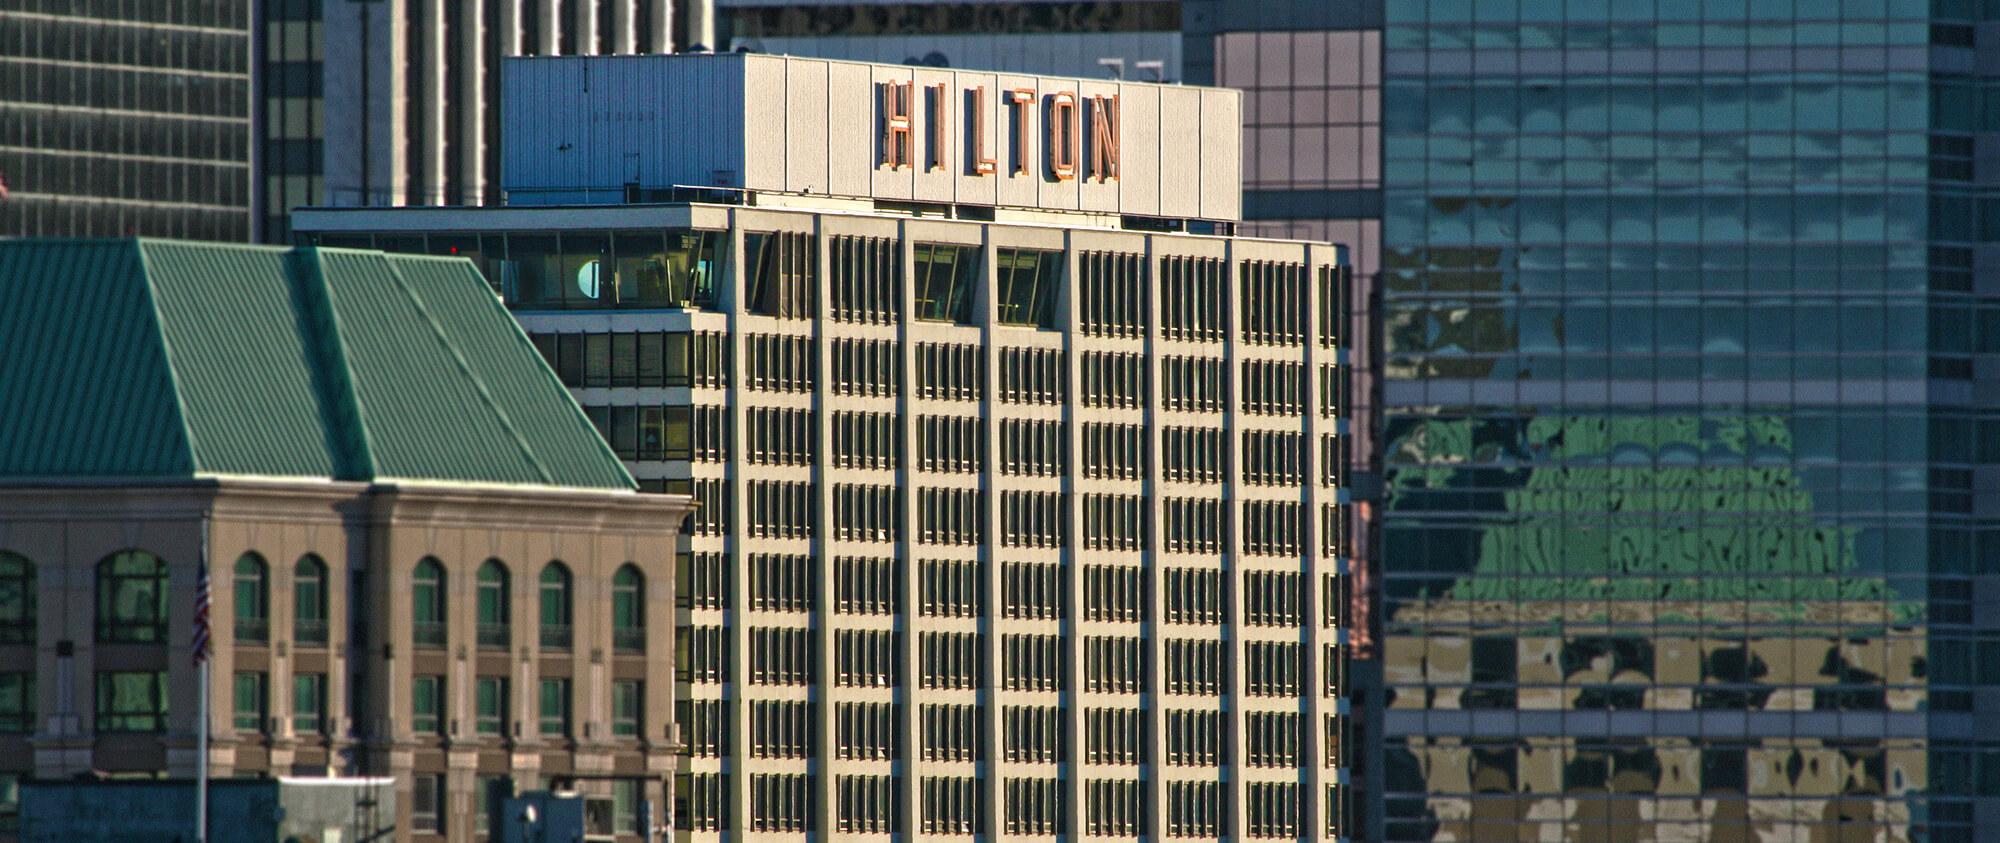 Hilton Hotel | General Contractor, Construction Management